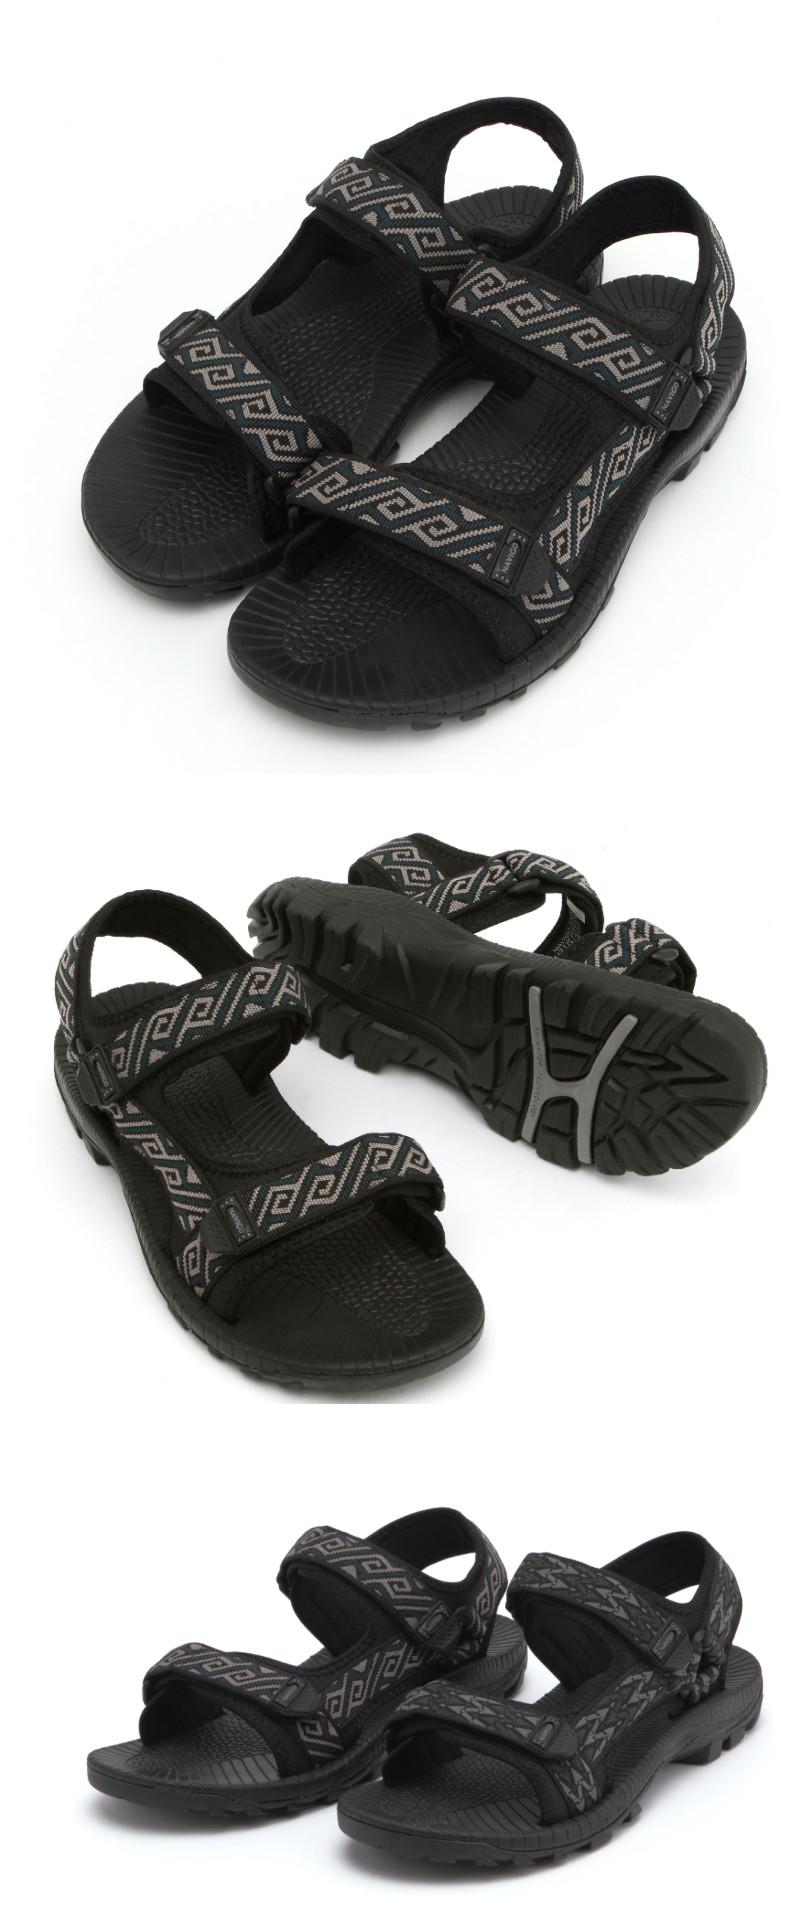 2015 Men New Design Boy Beach Walk Sandal Slippers Beach Shoes ...